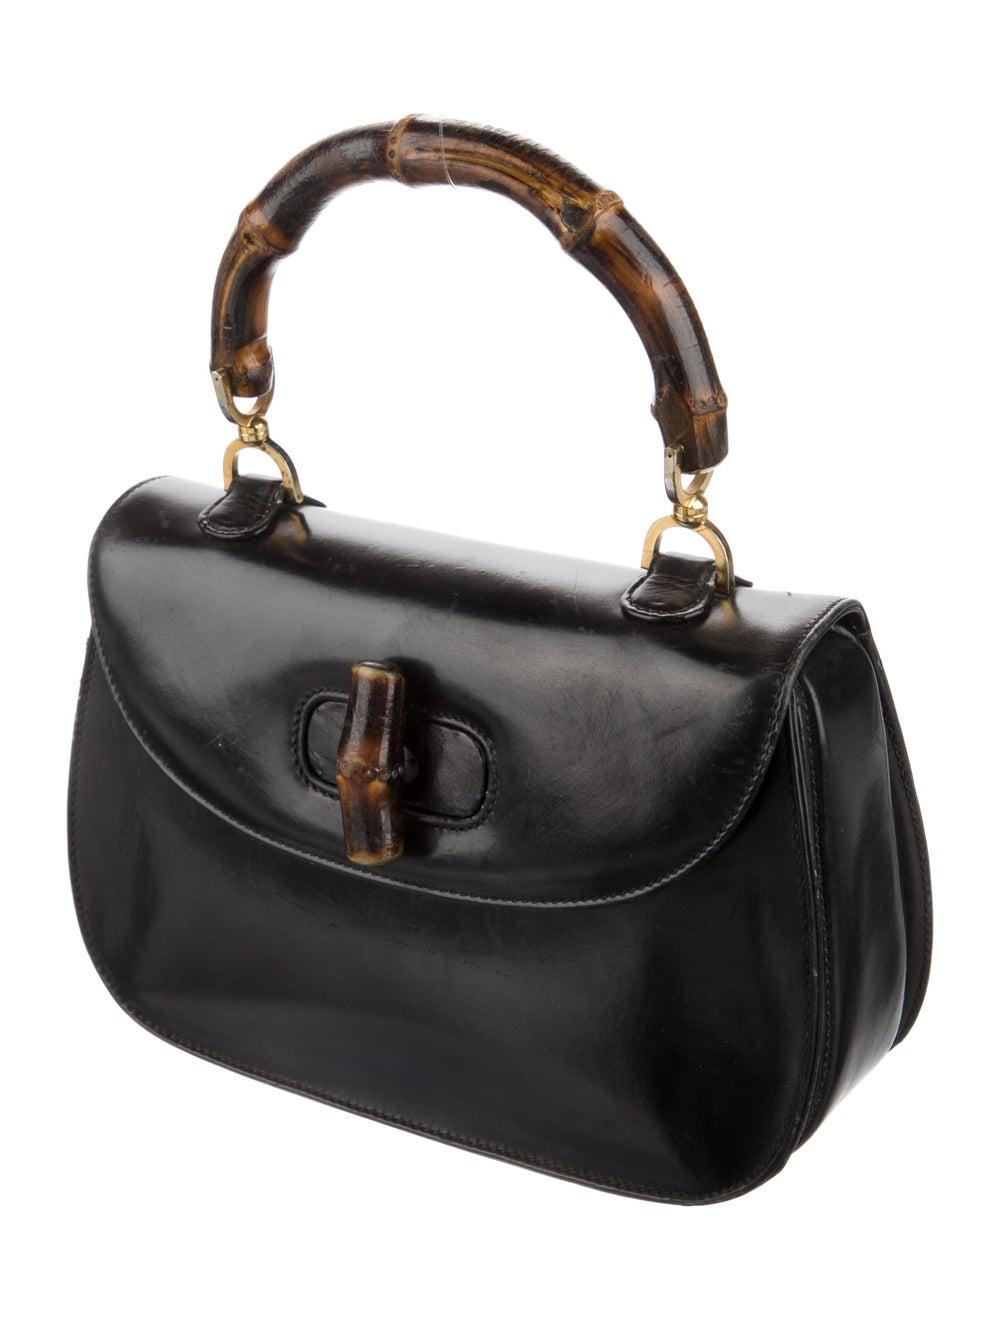 Gucci Vintage Leather Bamboo Top Handle Bag Black - image 3